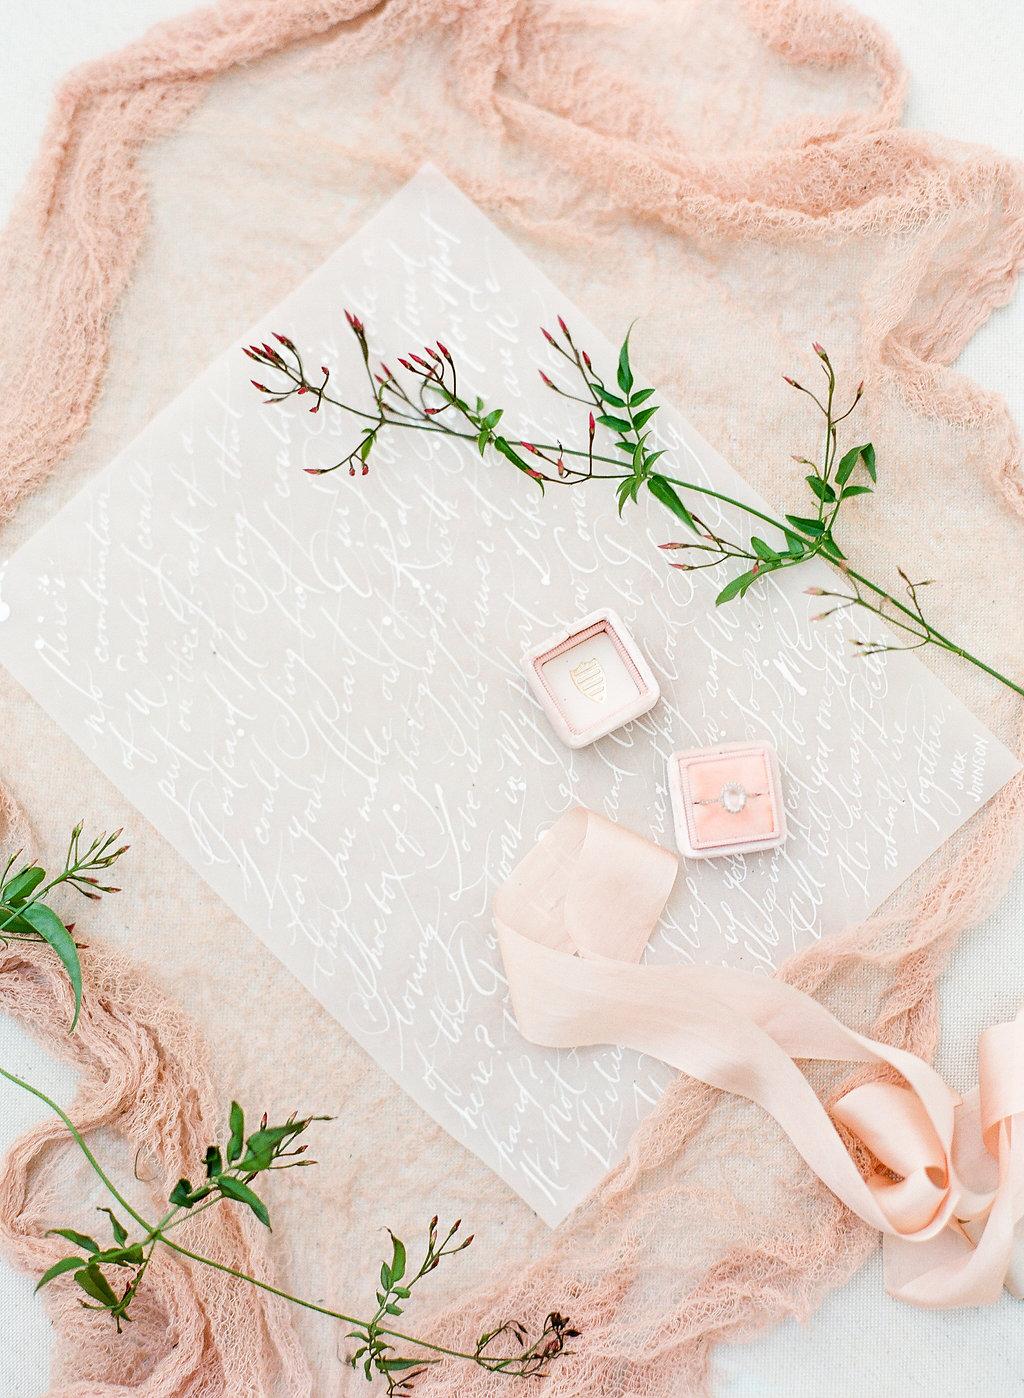 the-happy-bloom-wormsloe-wedding-savannah-wedding-ivory-and-beau-bridal-boutique-savannah-wedding-dresses-savannah-bridal-boutique-georgia-bridal-boutique-design-studio-south-sunset-wedding-blush-by-hayley-paige-candi-1550-blush-wedding-dress-3.jpg